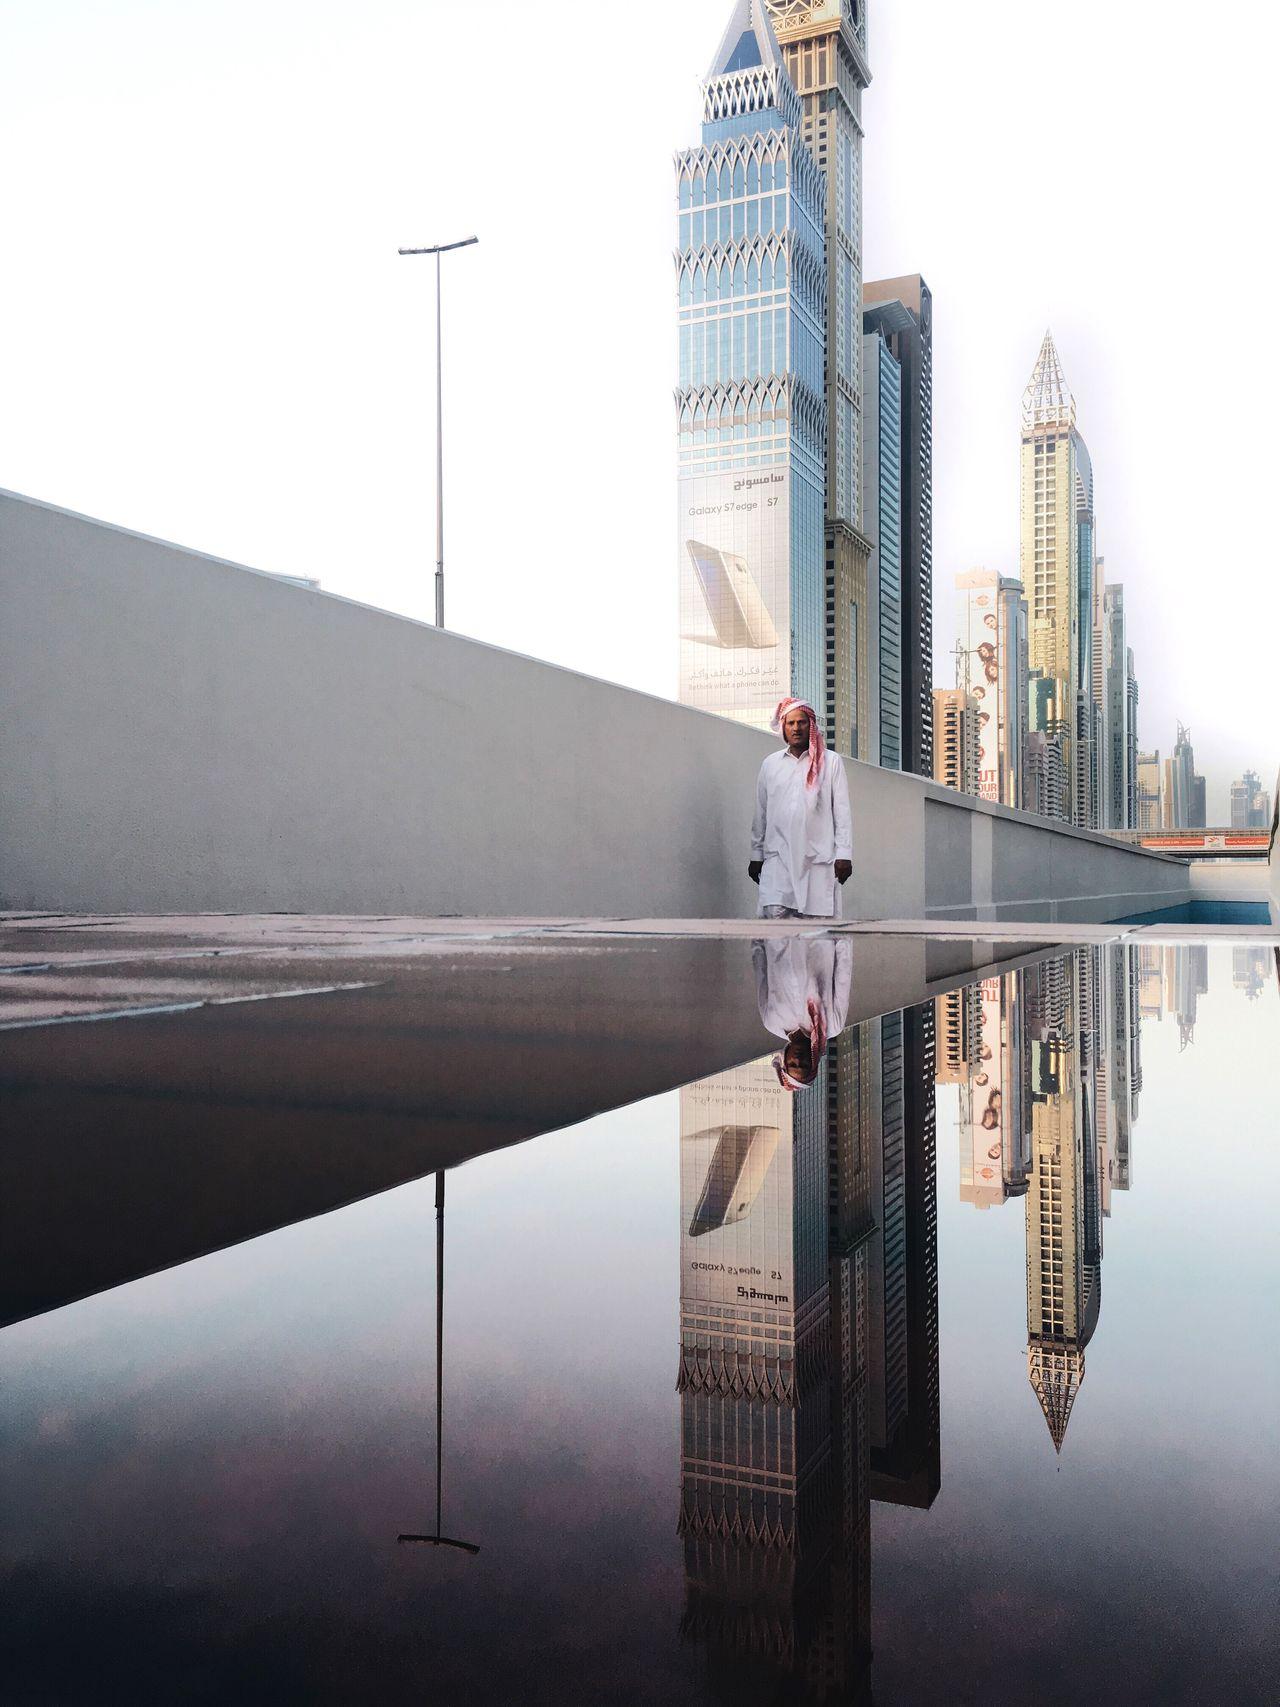 Beautiful stock photos of dubai, reflection, water, built structure, waterfront